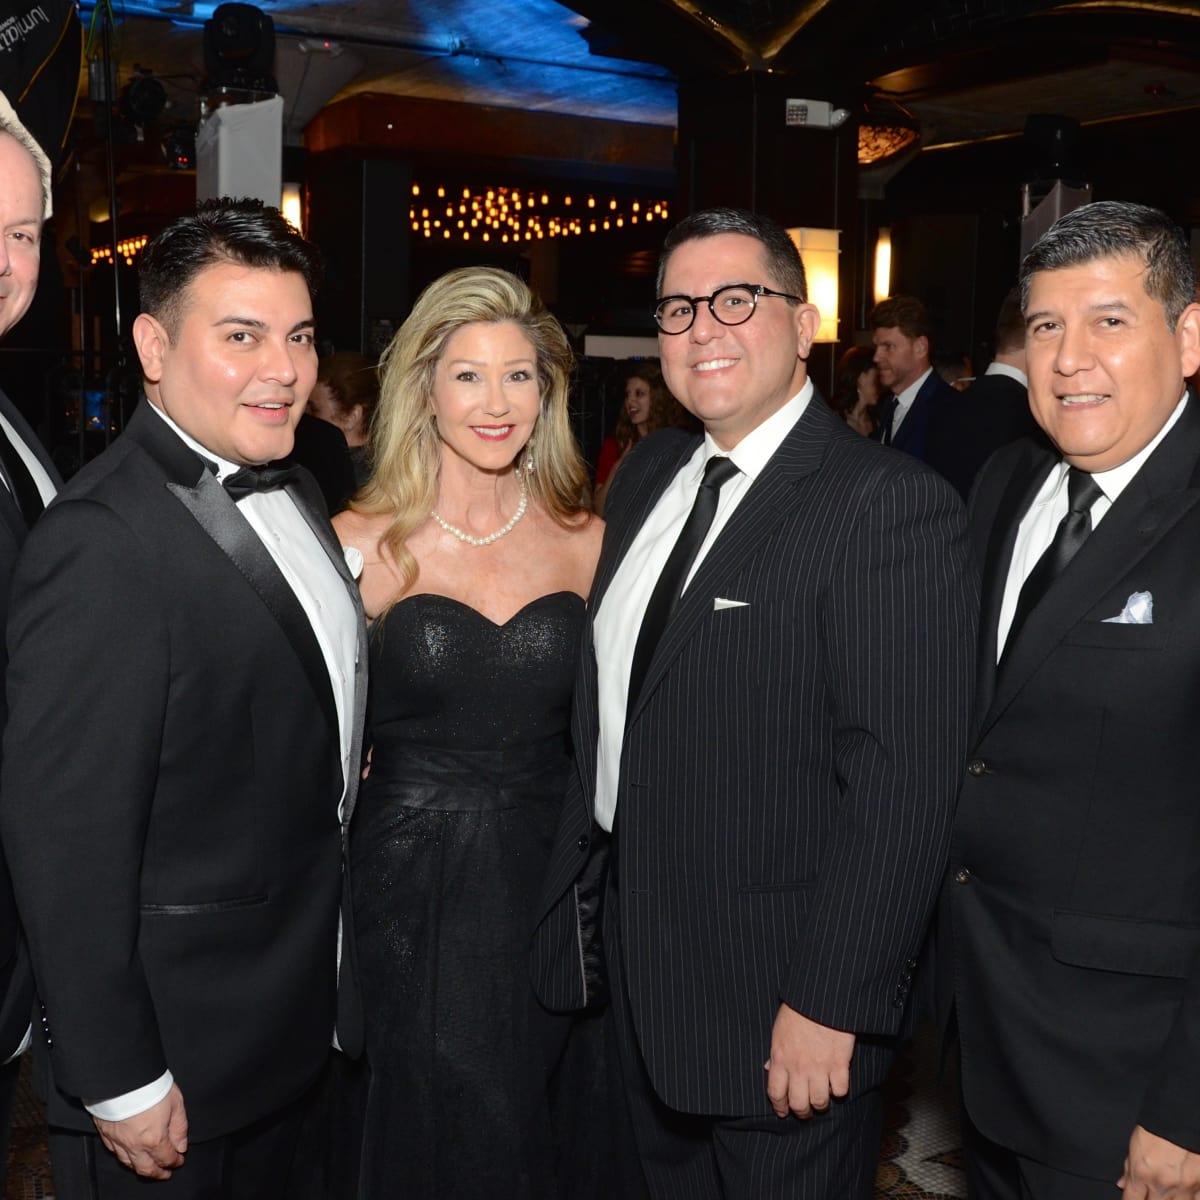 Scott Miller, Edward Sanchez, Patti Murphy, Roland Maldonado, Raul Diaz at Stages Gala